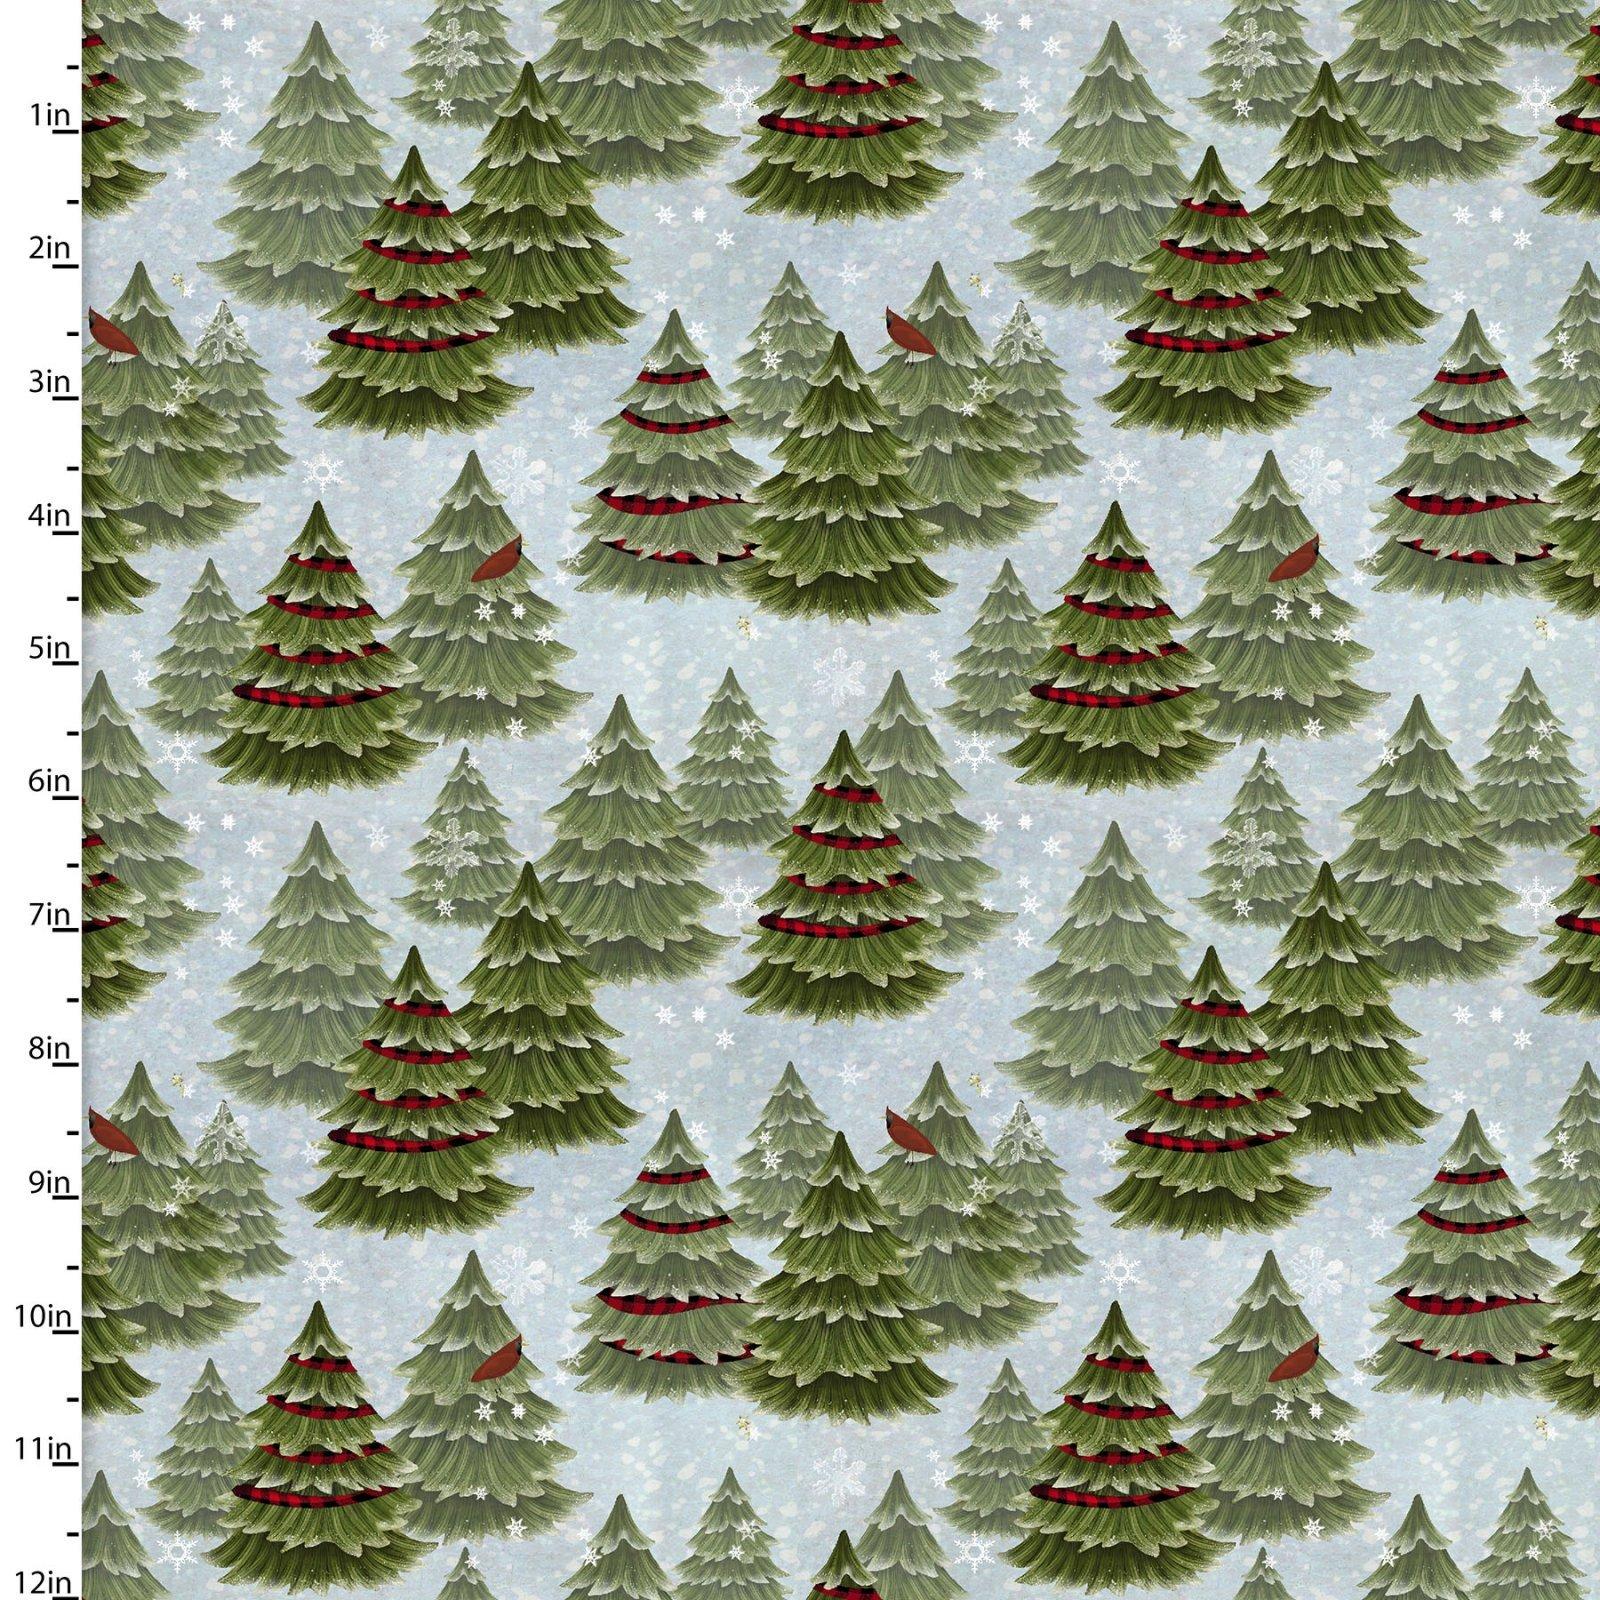 3JINGLEALLWAY 16629 - BLU - CHRISTMAS TREES